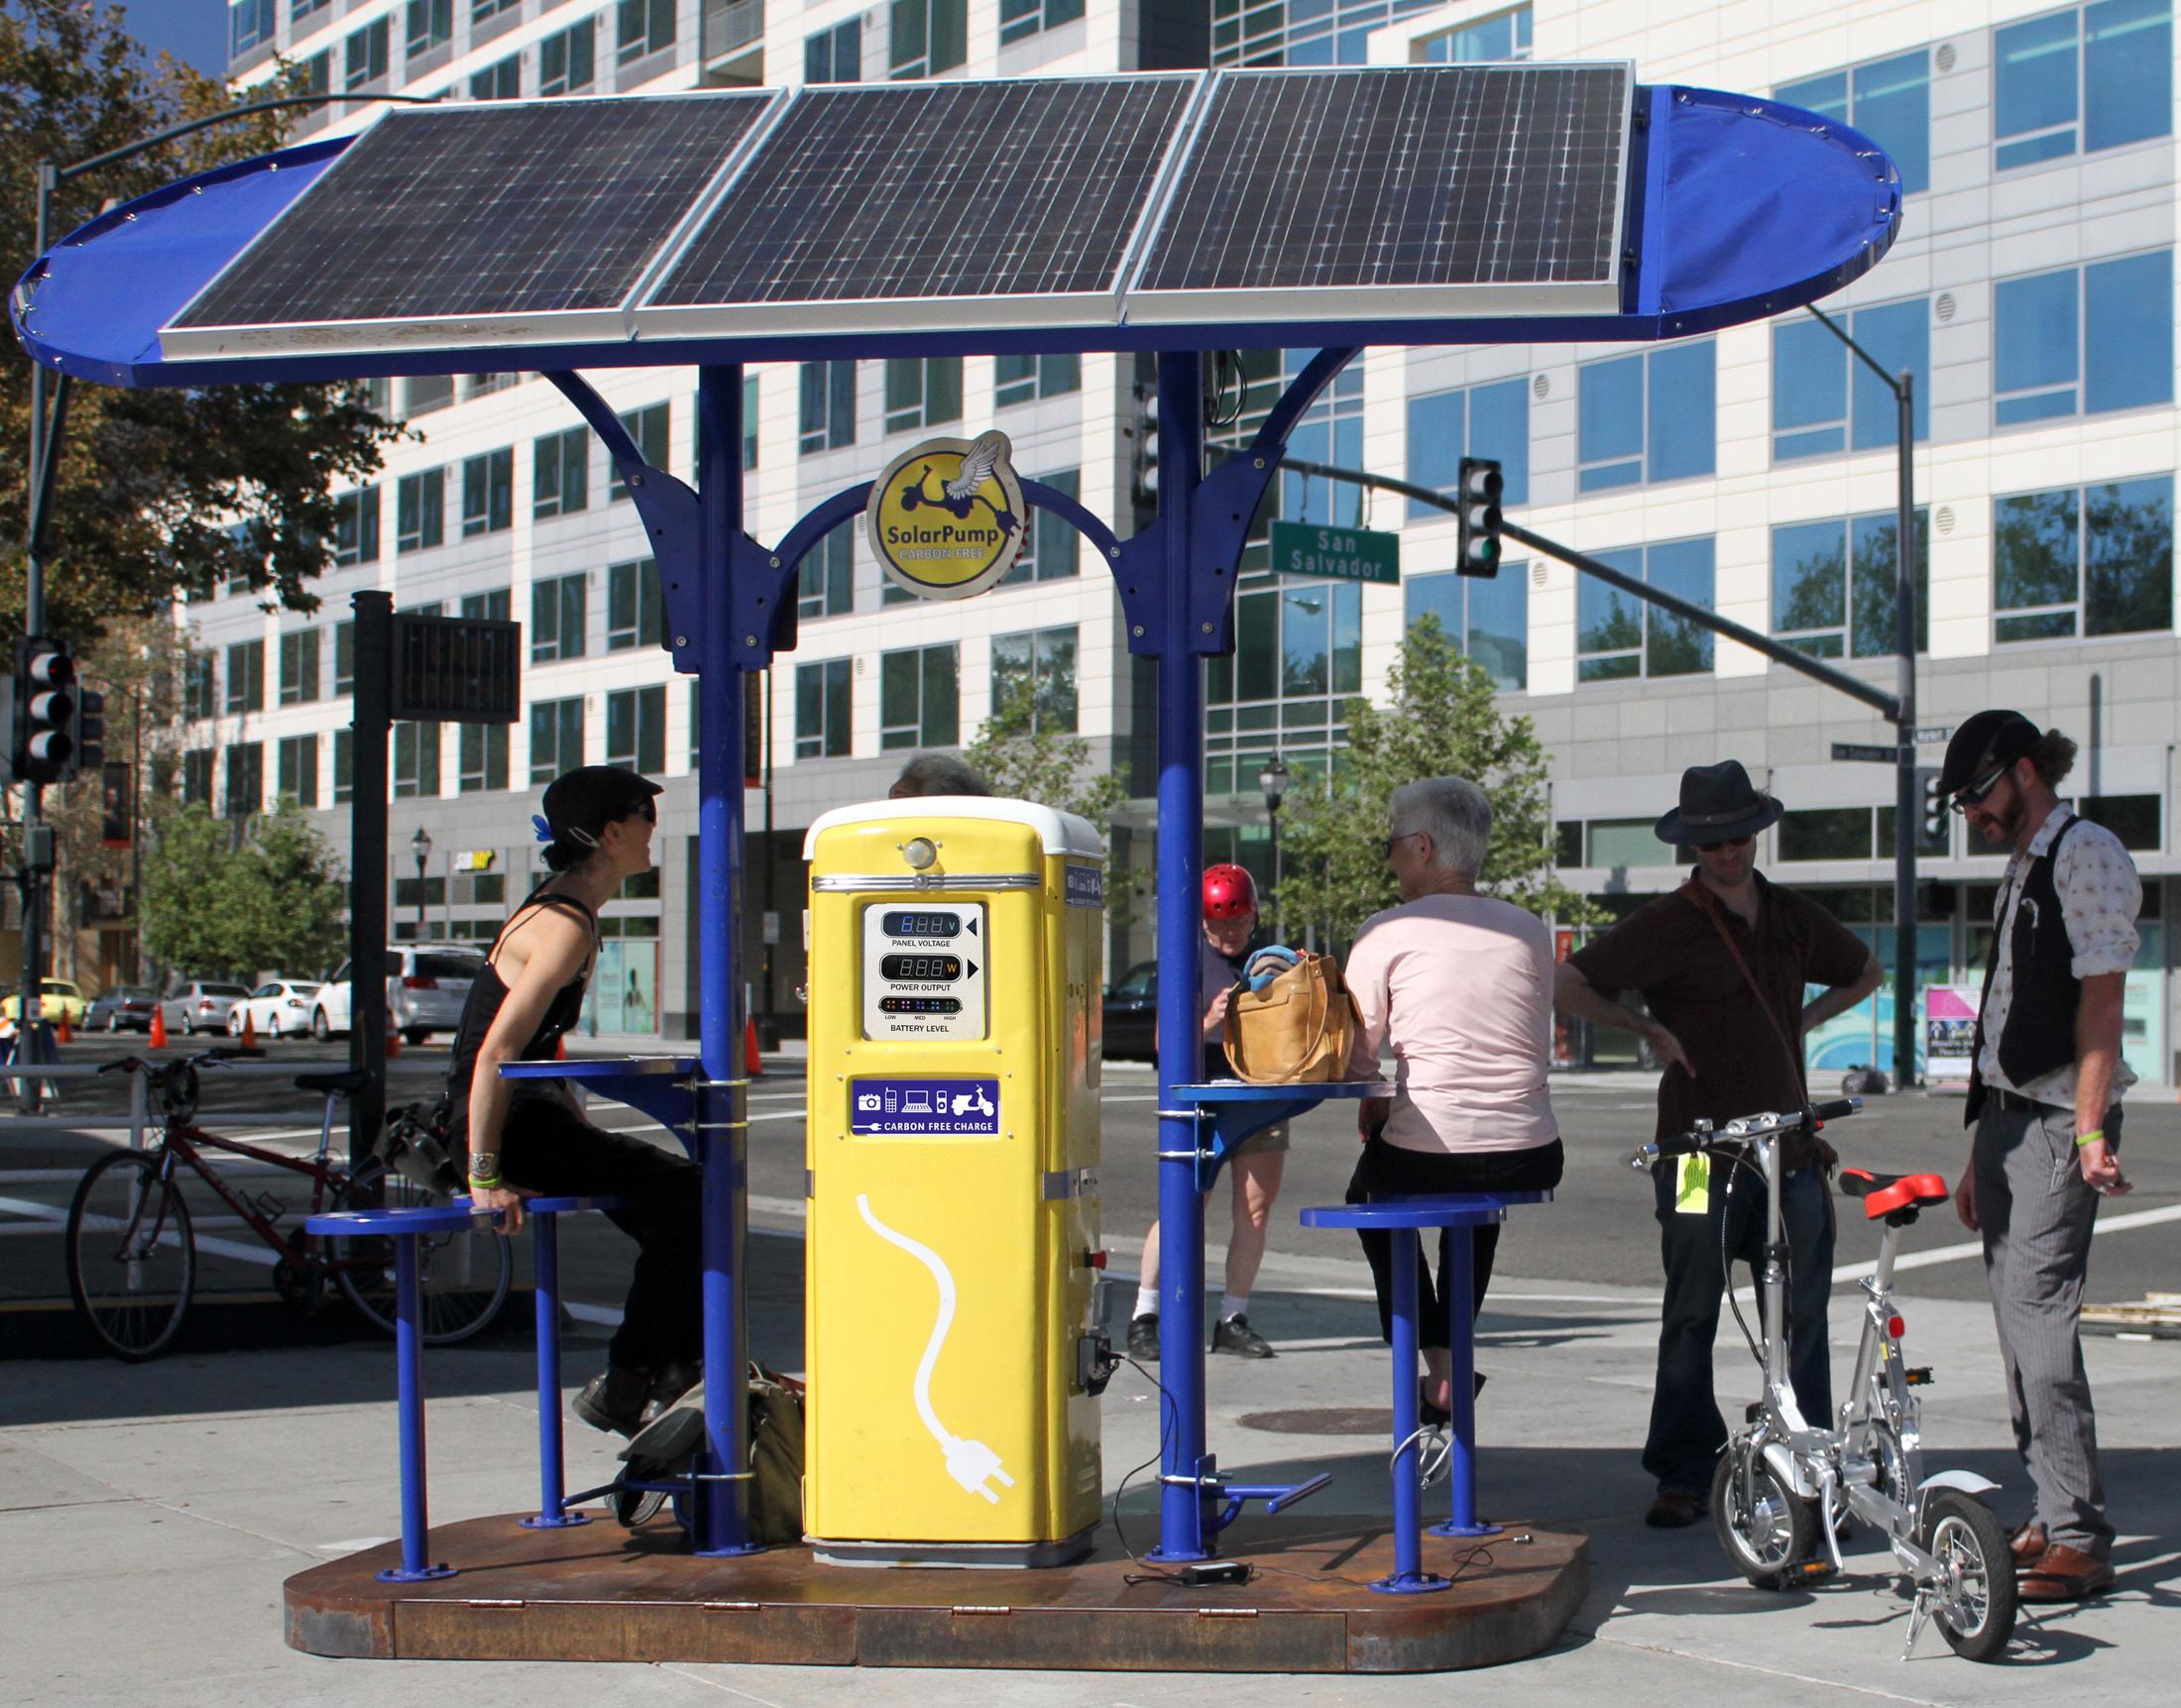 SolarPump Charging Stations